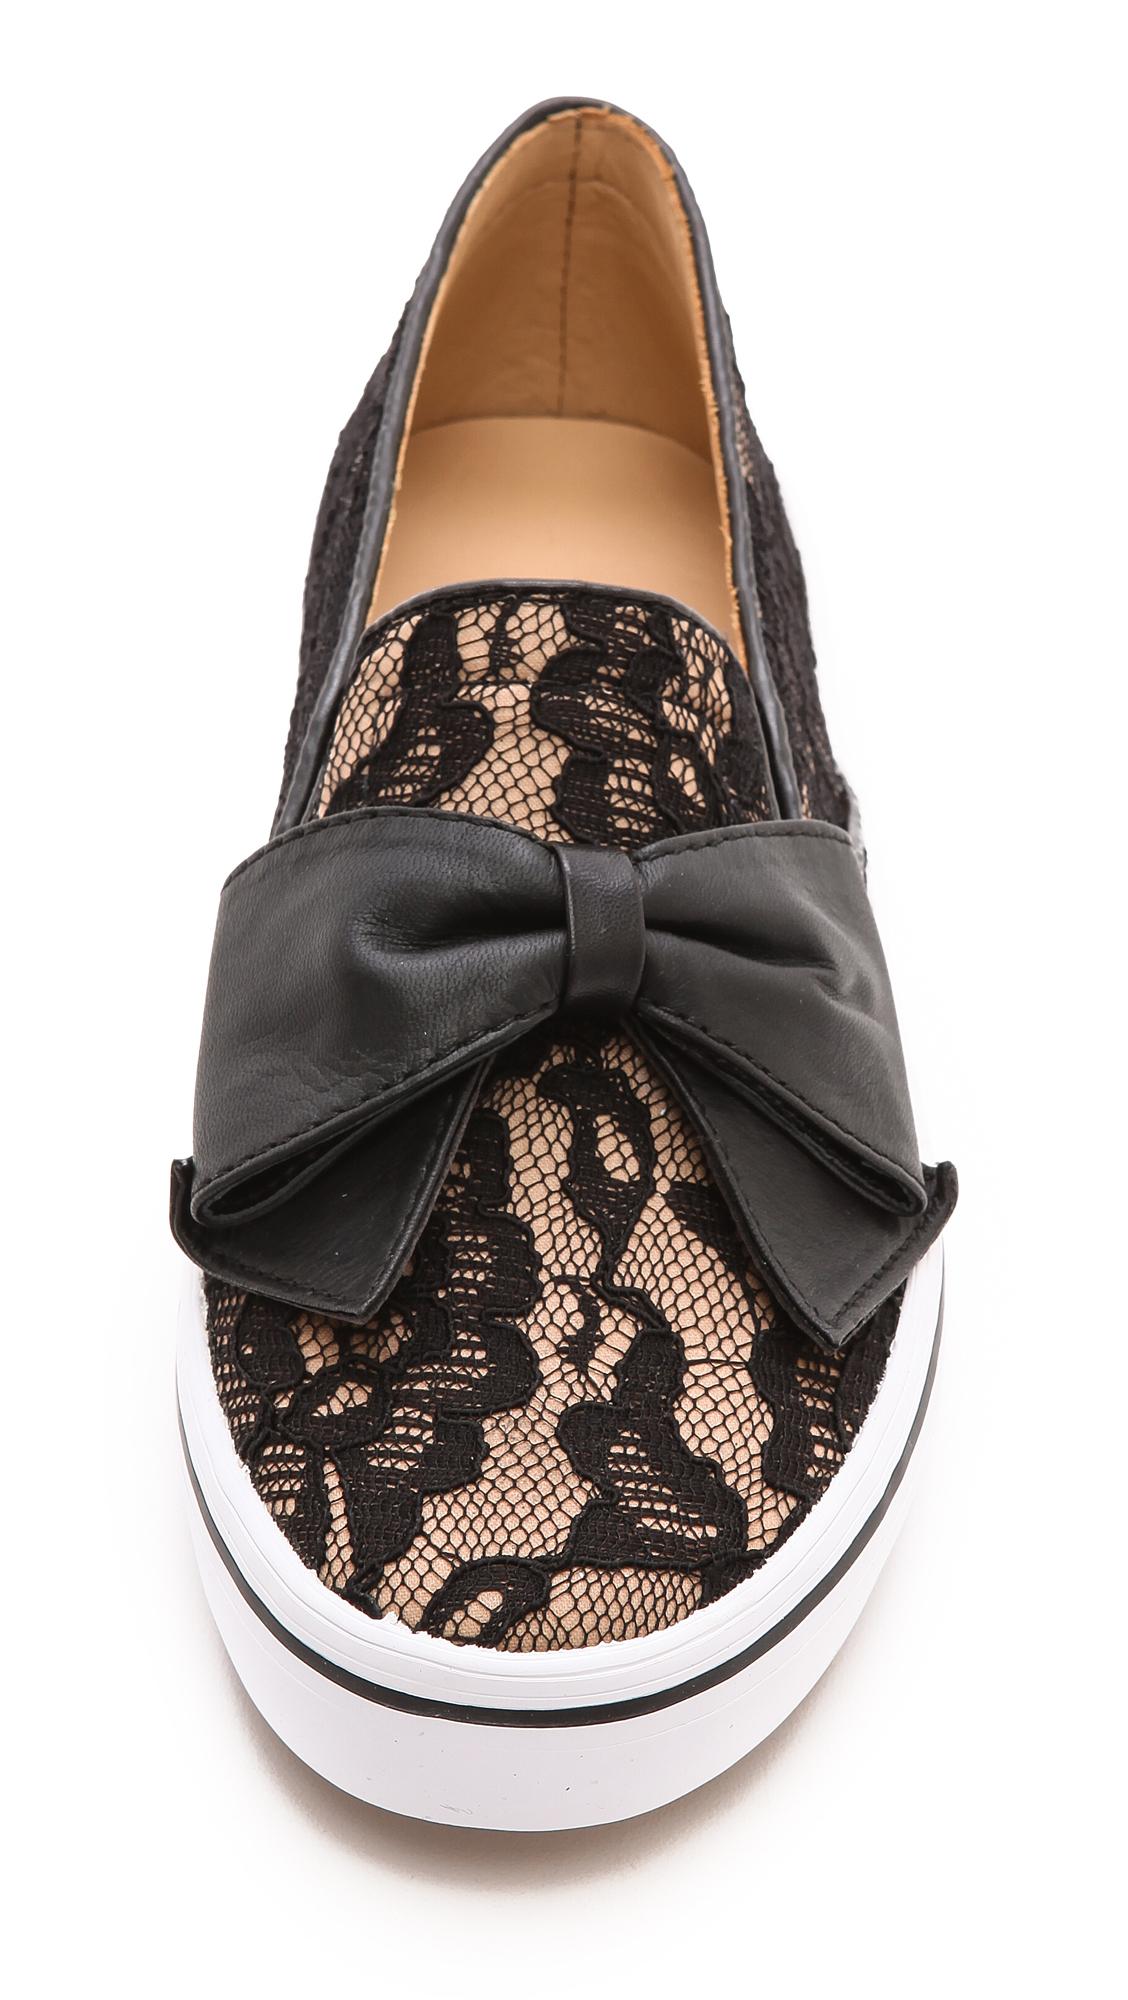 Lyst Kate Spade New York Delise Bow Slip On Sneakers